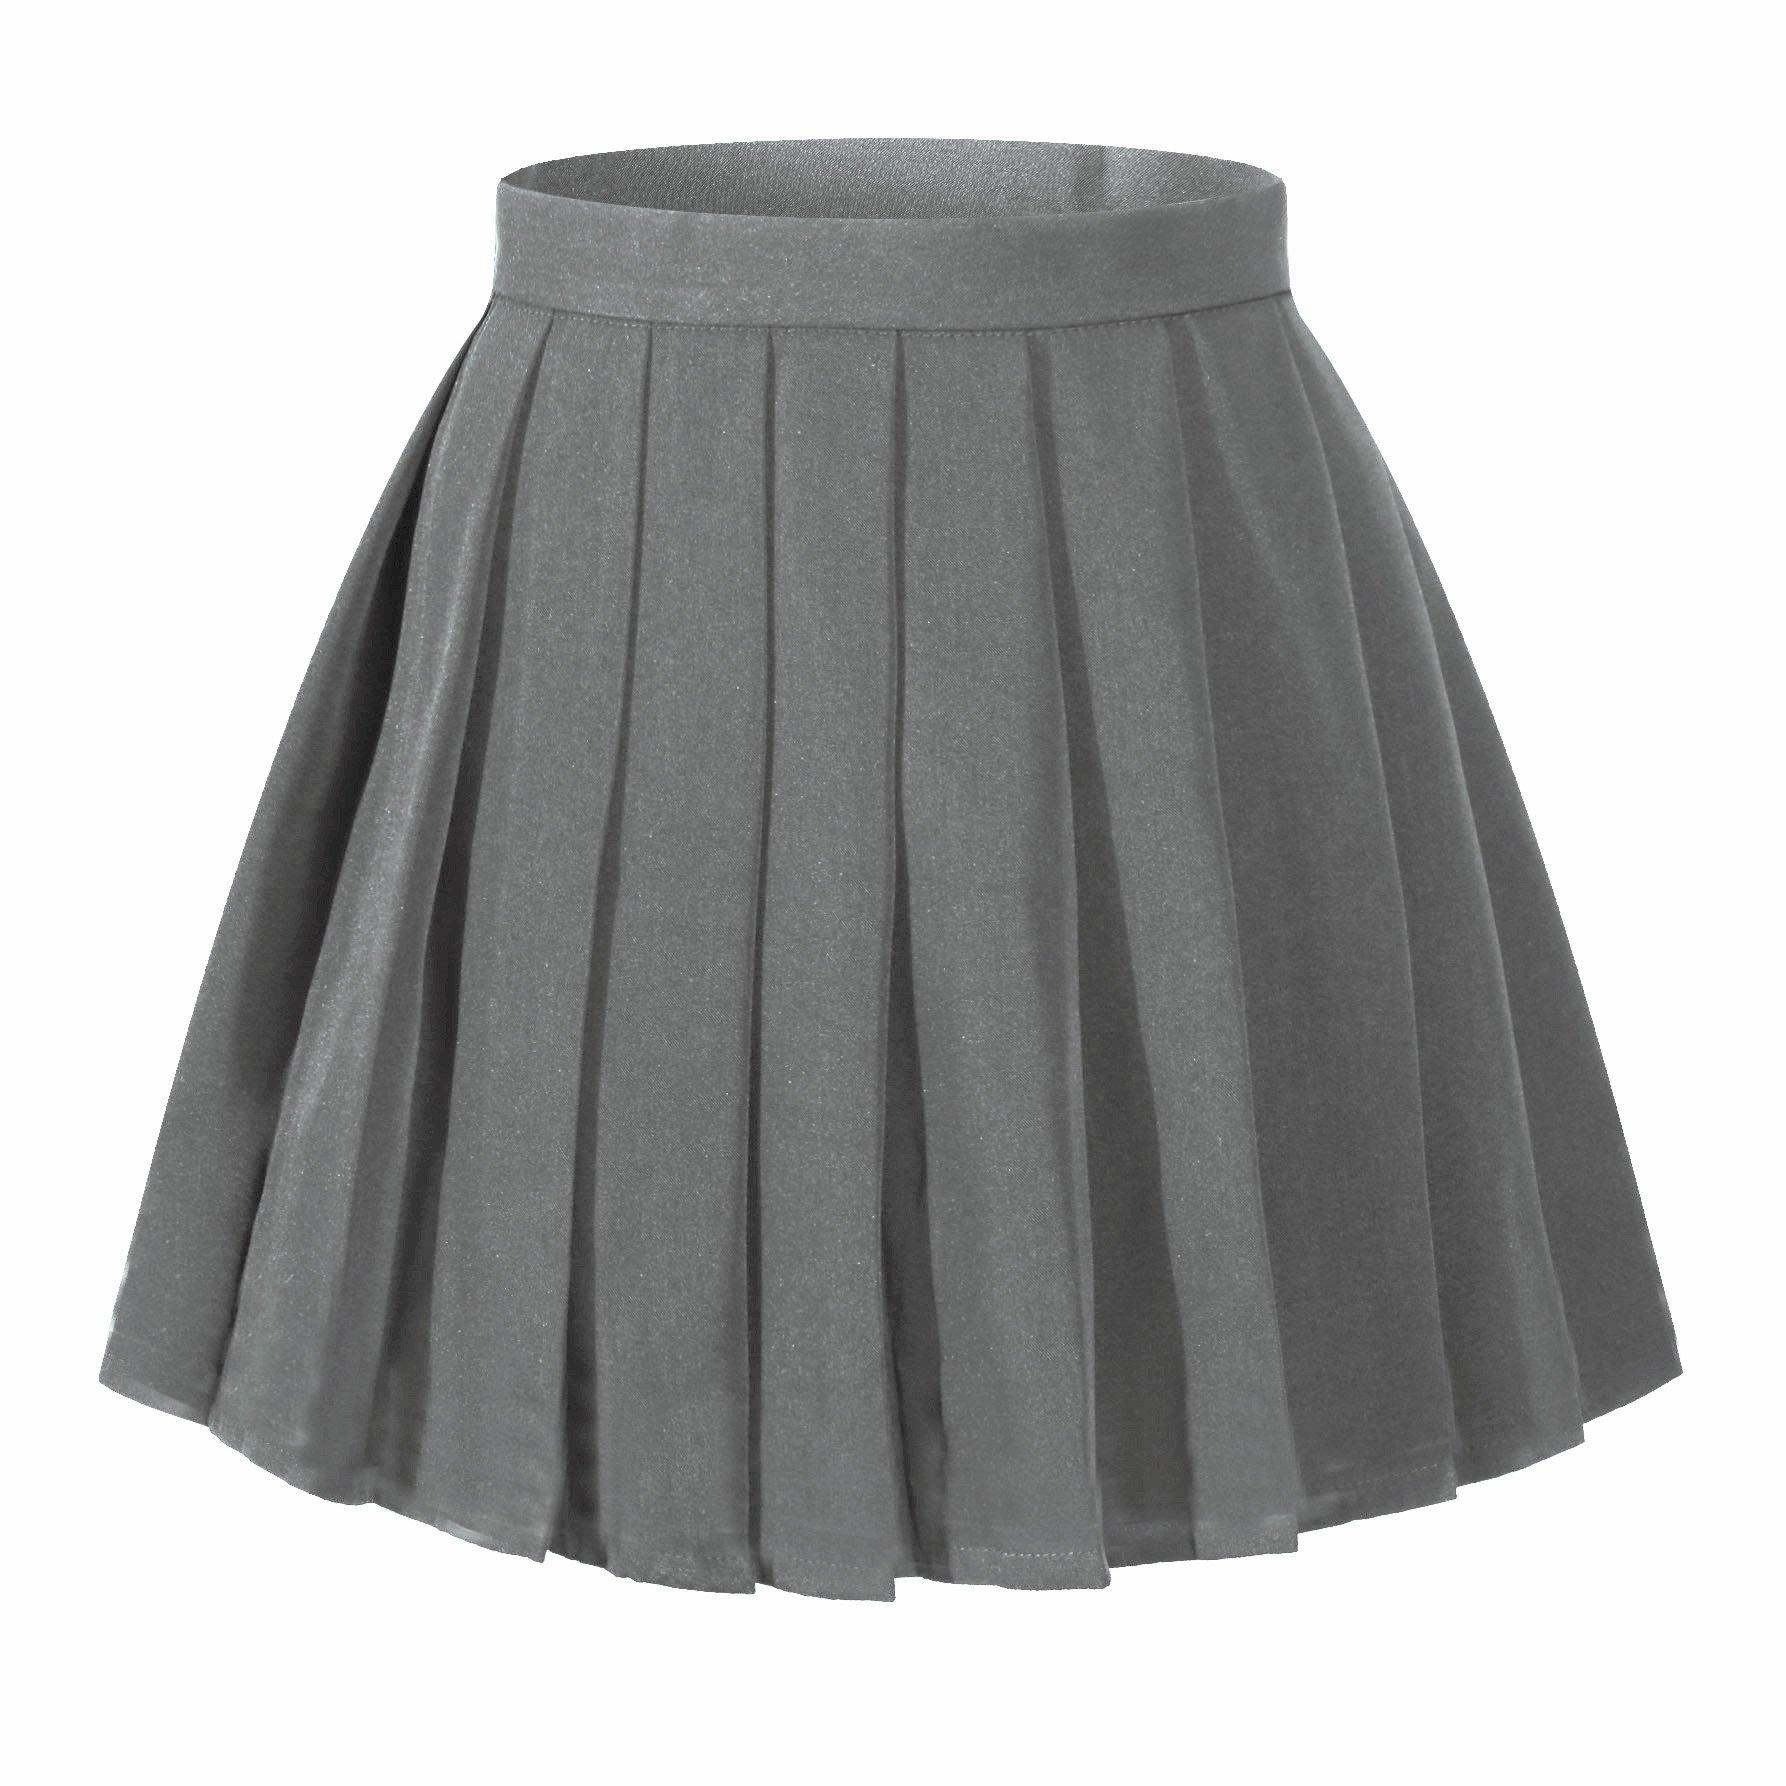 Girl's Japan School Plain Solid Pleated Costumes Skirts (M,Dark grey )